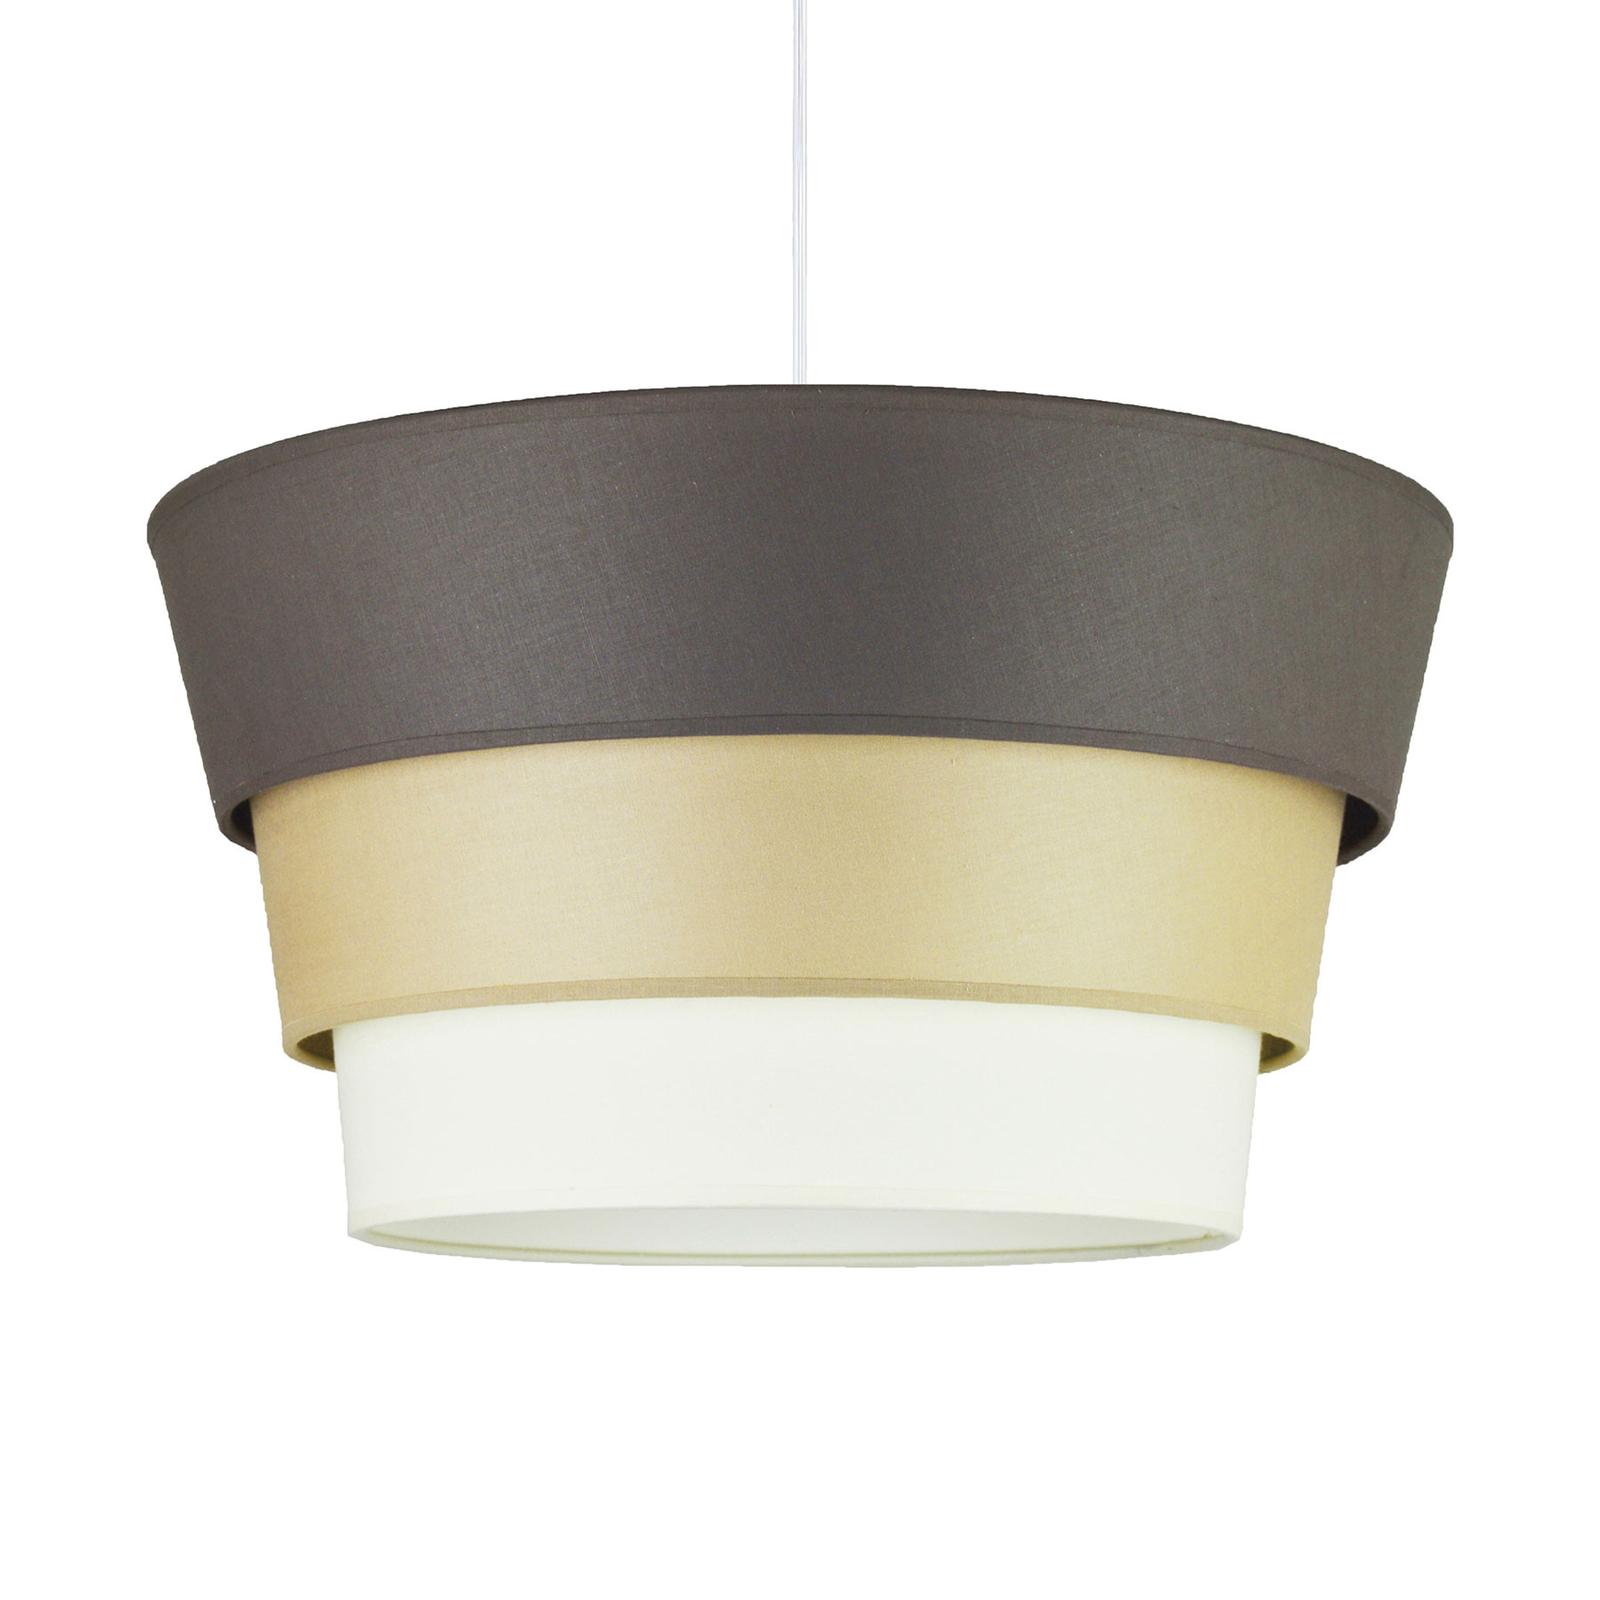 Hanglamp Piramida, antraciet/cappuccino/wit